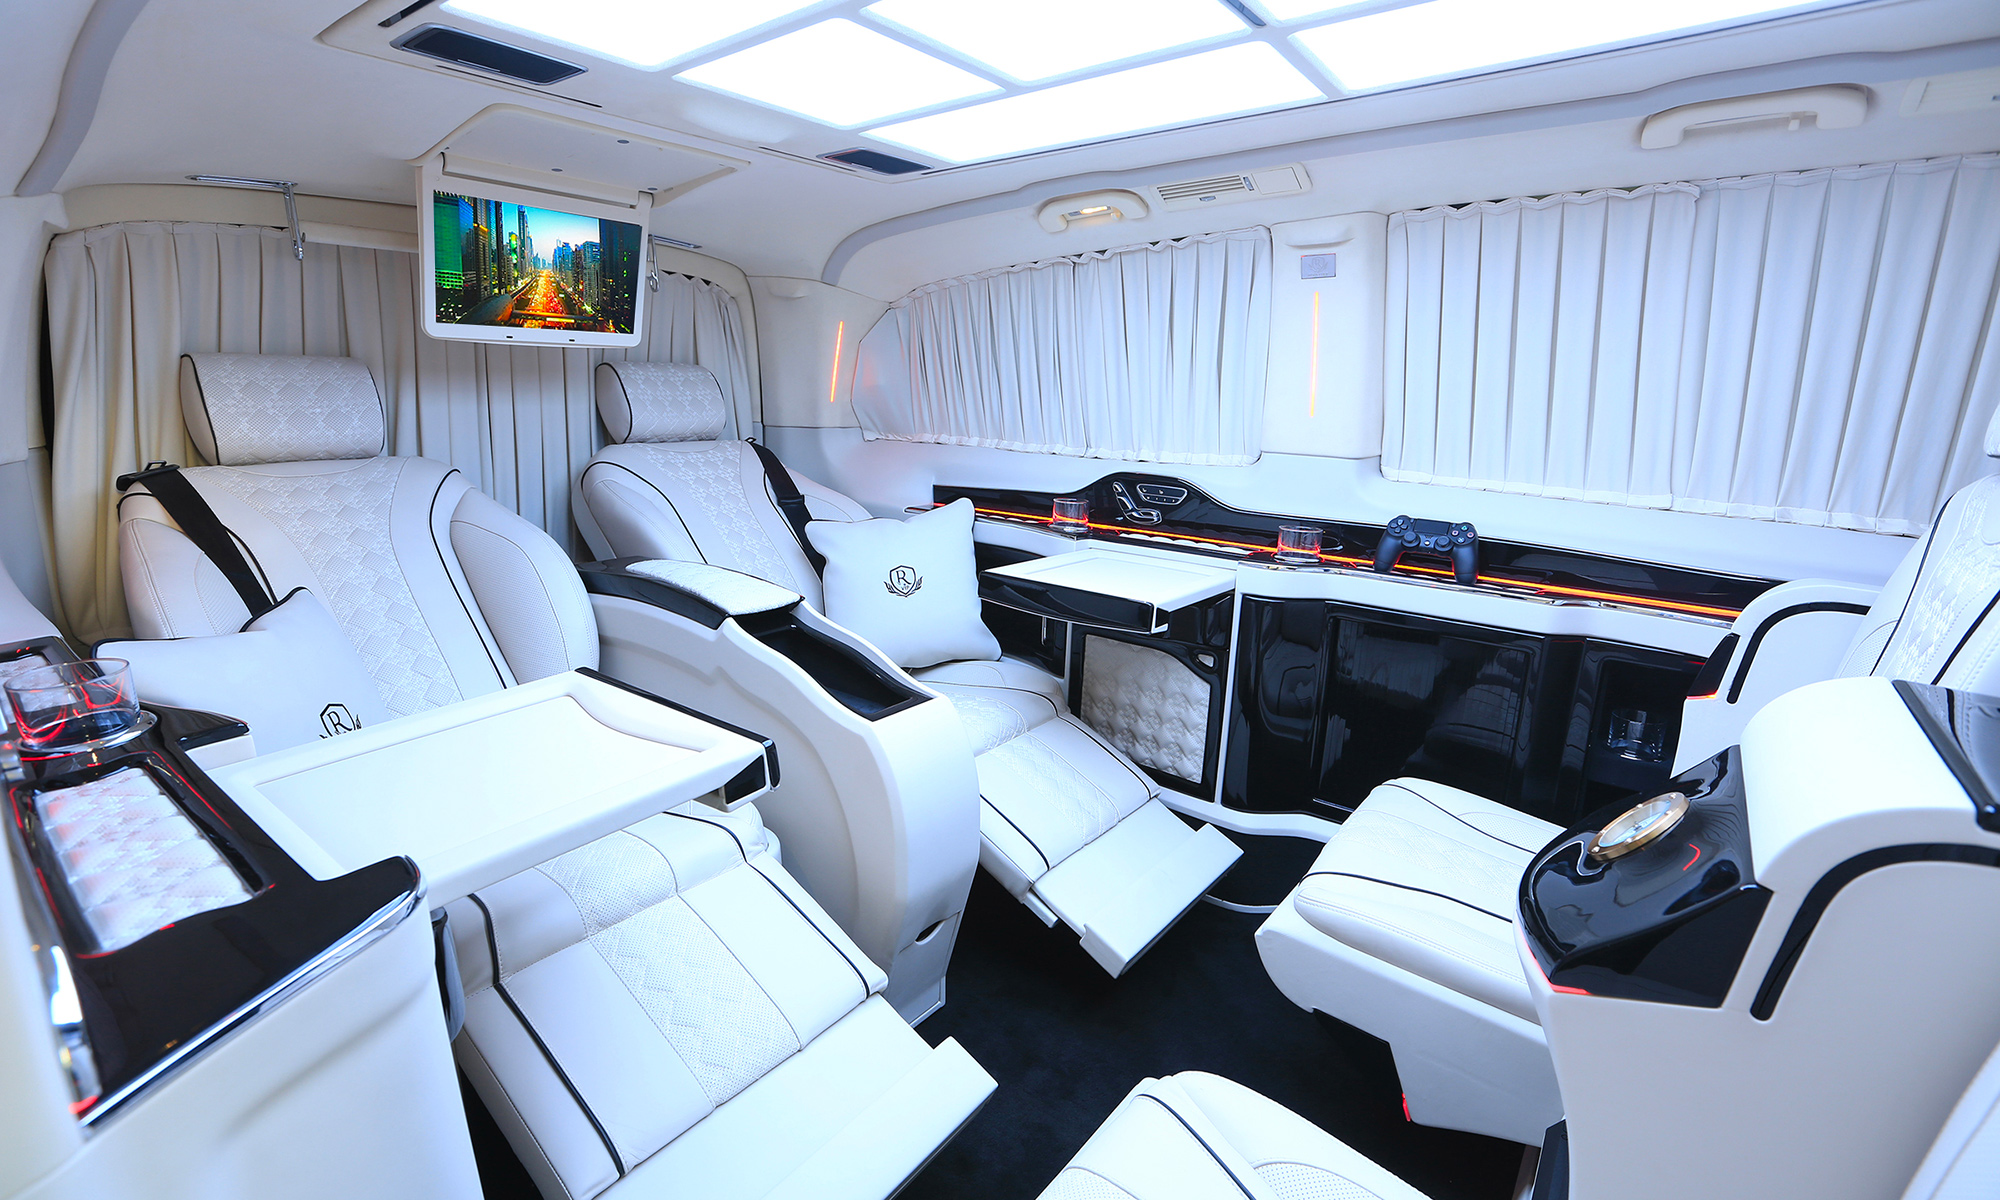 Mercedes Benz Sprinter >> Mercedes-Benz Royal MB VIP Van | Rovelver Vip Auto Design